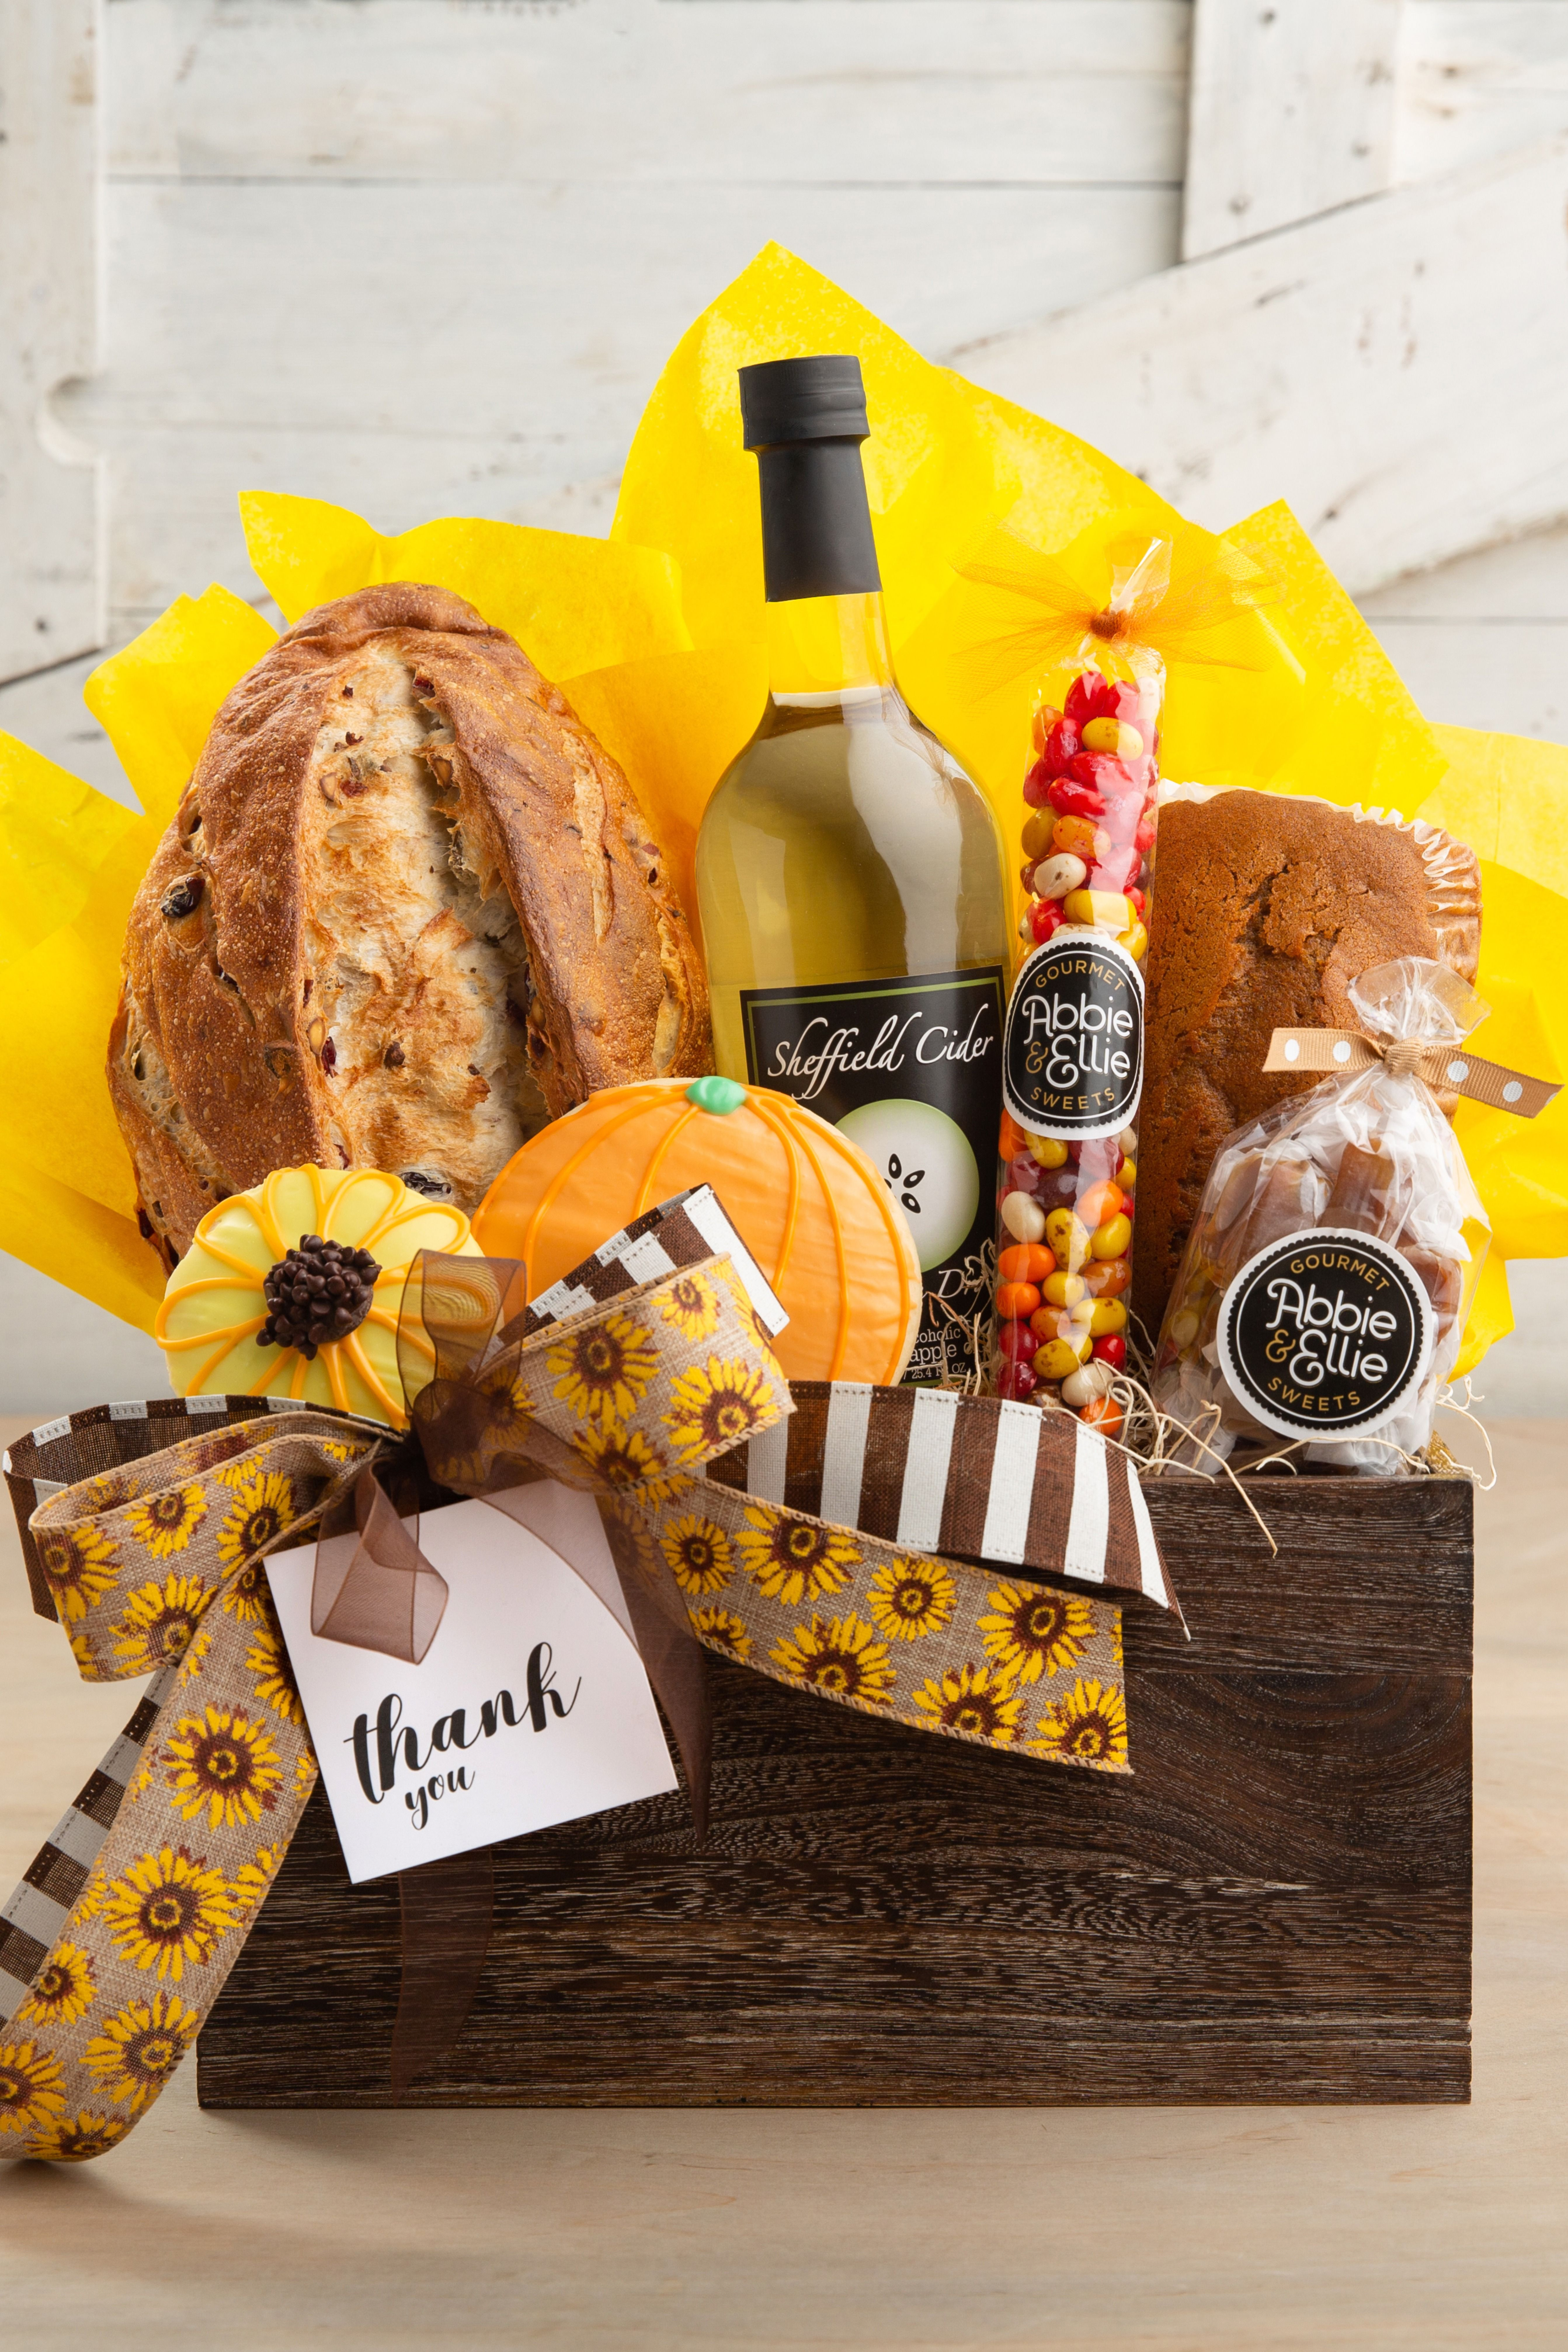 Autumn thank you gift basket in 2020 pumpkin sugar